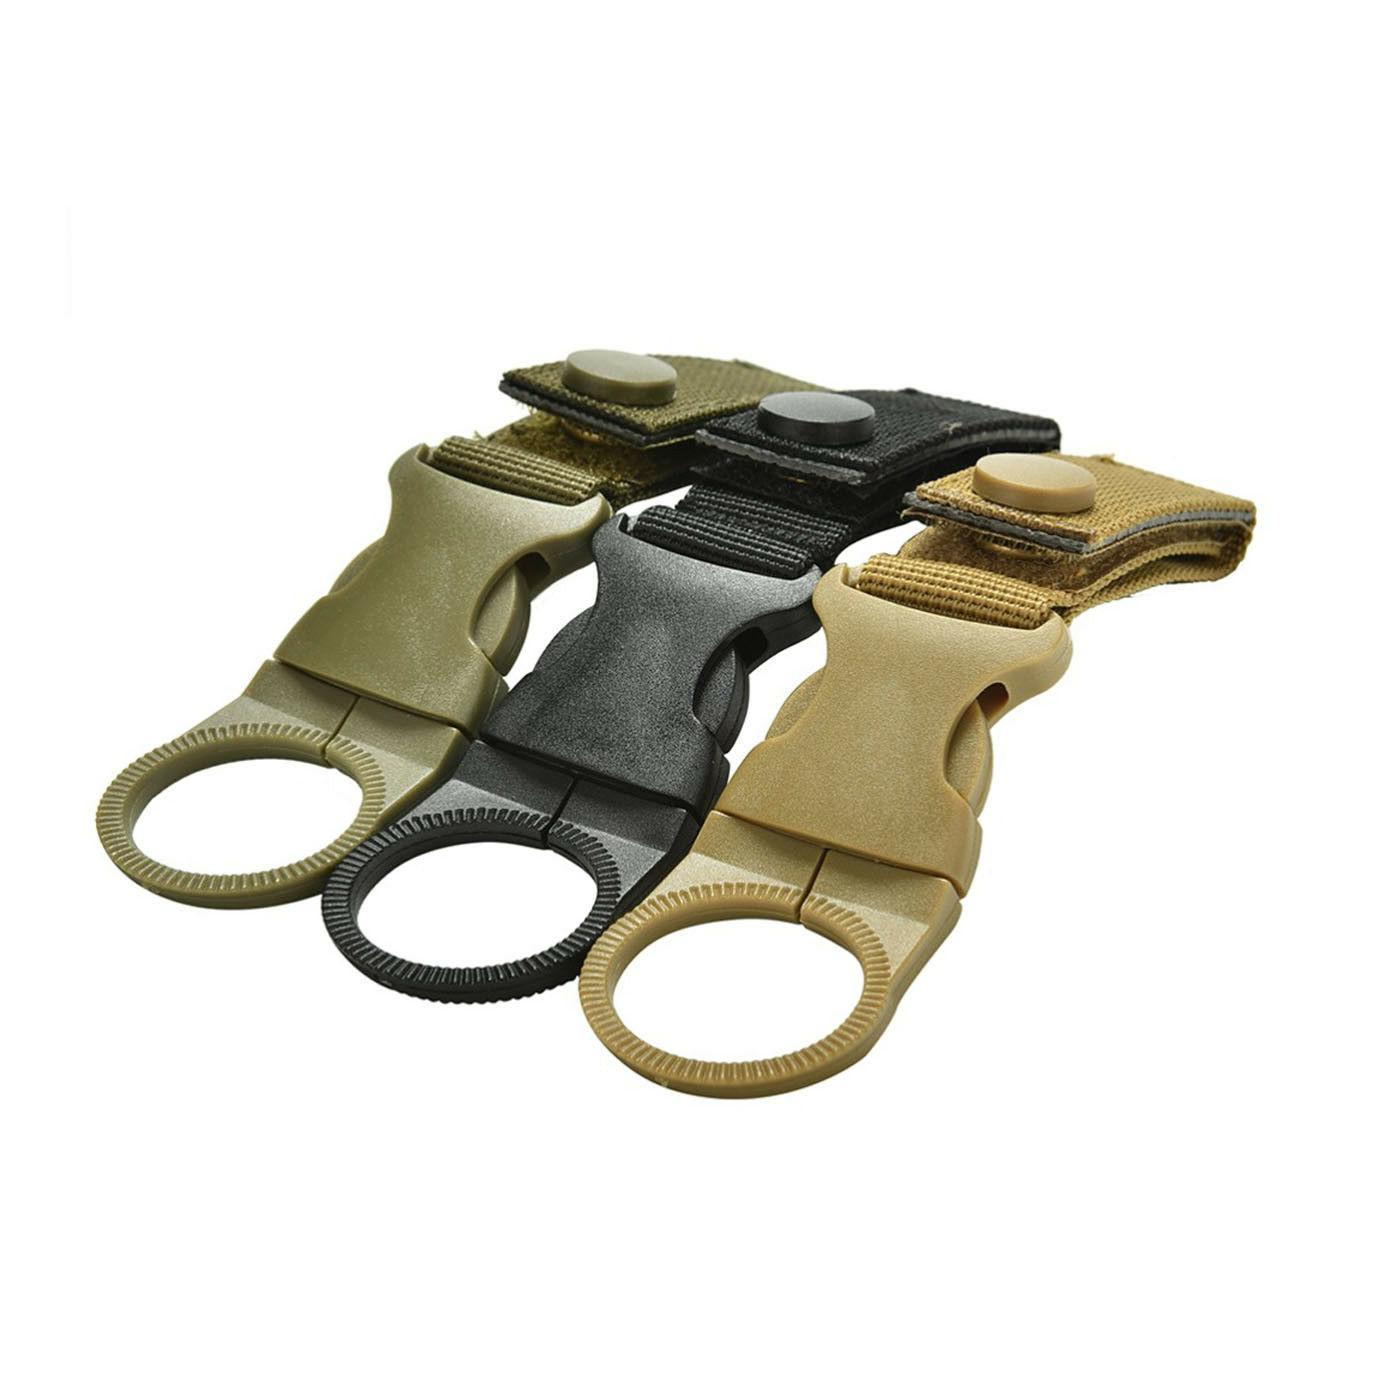 Khaki Tactical MOLLE Webbing Strap Clip Water Drink Bottle Holder For Waist Belt